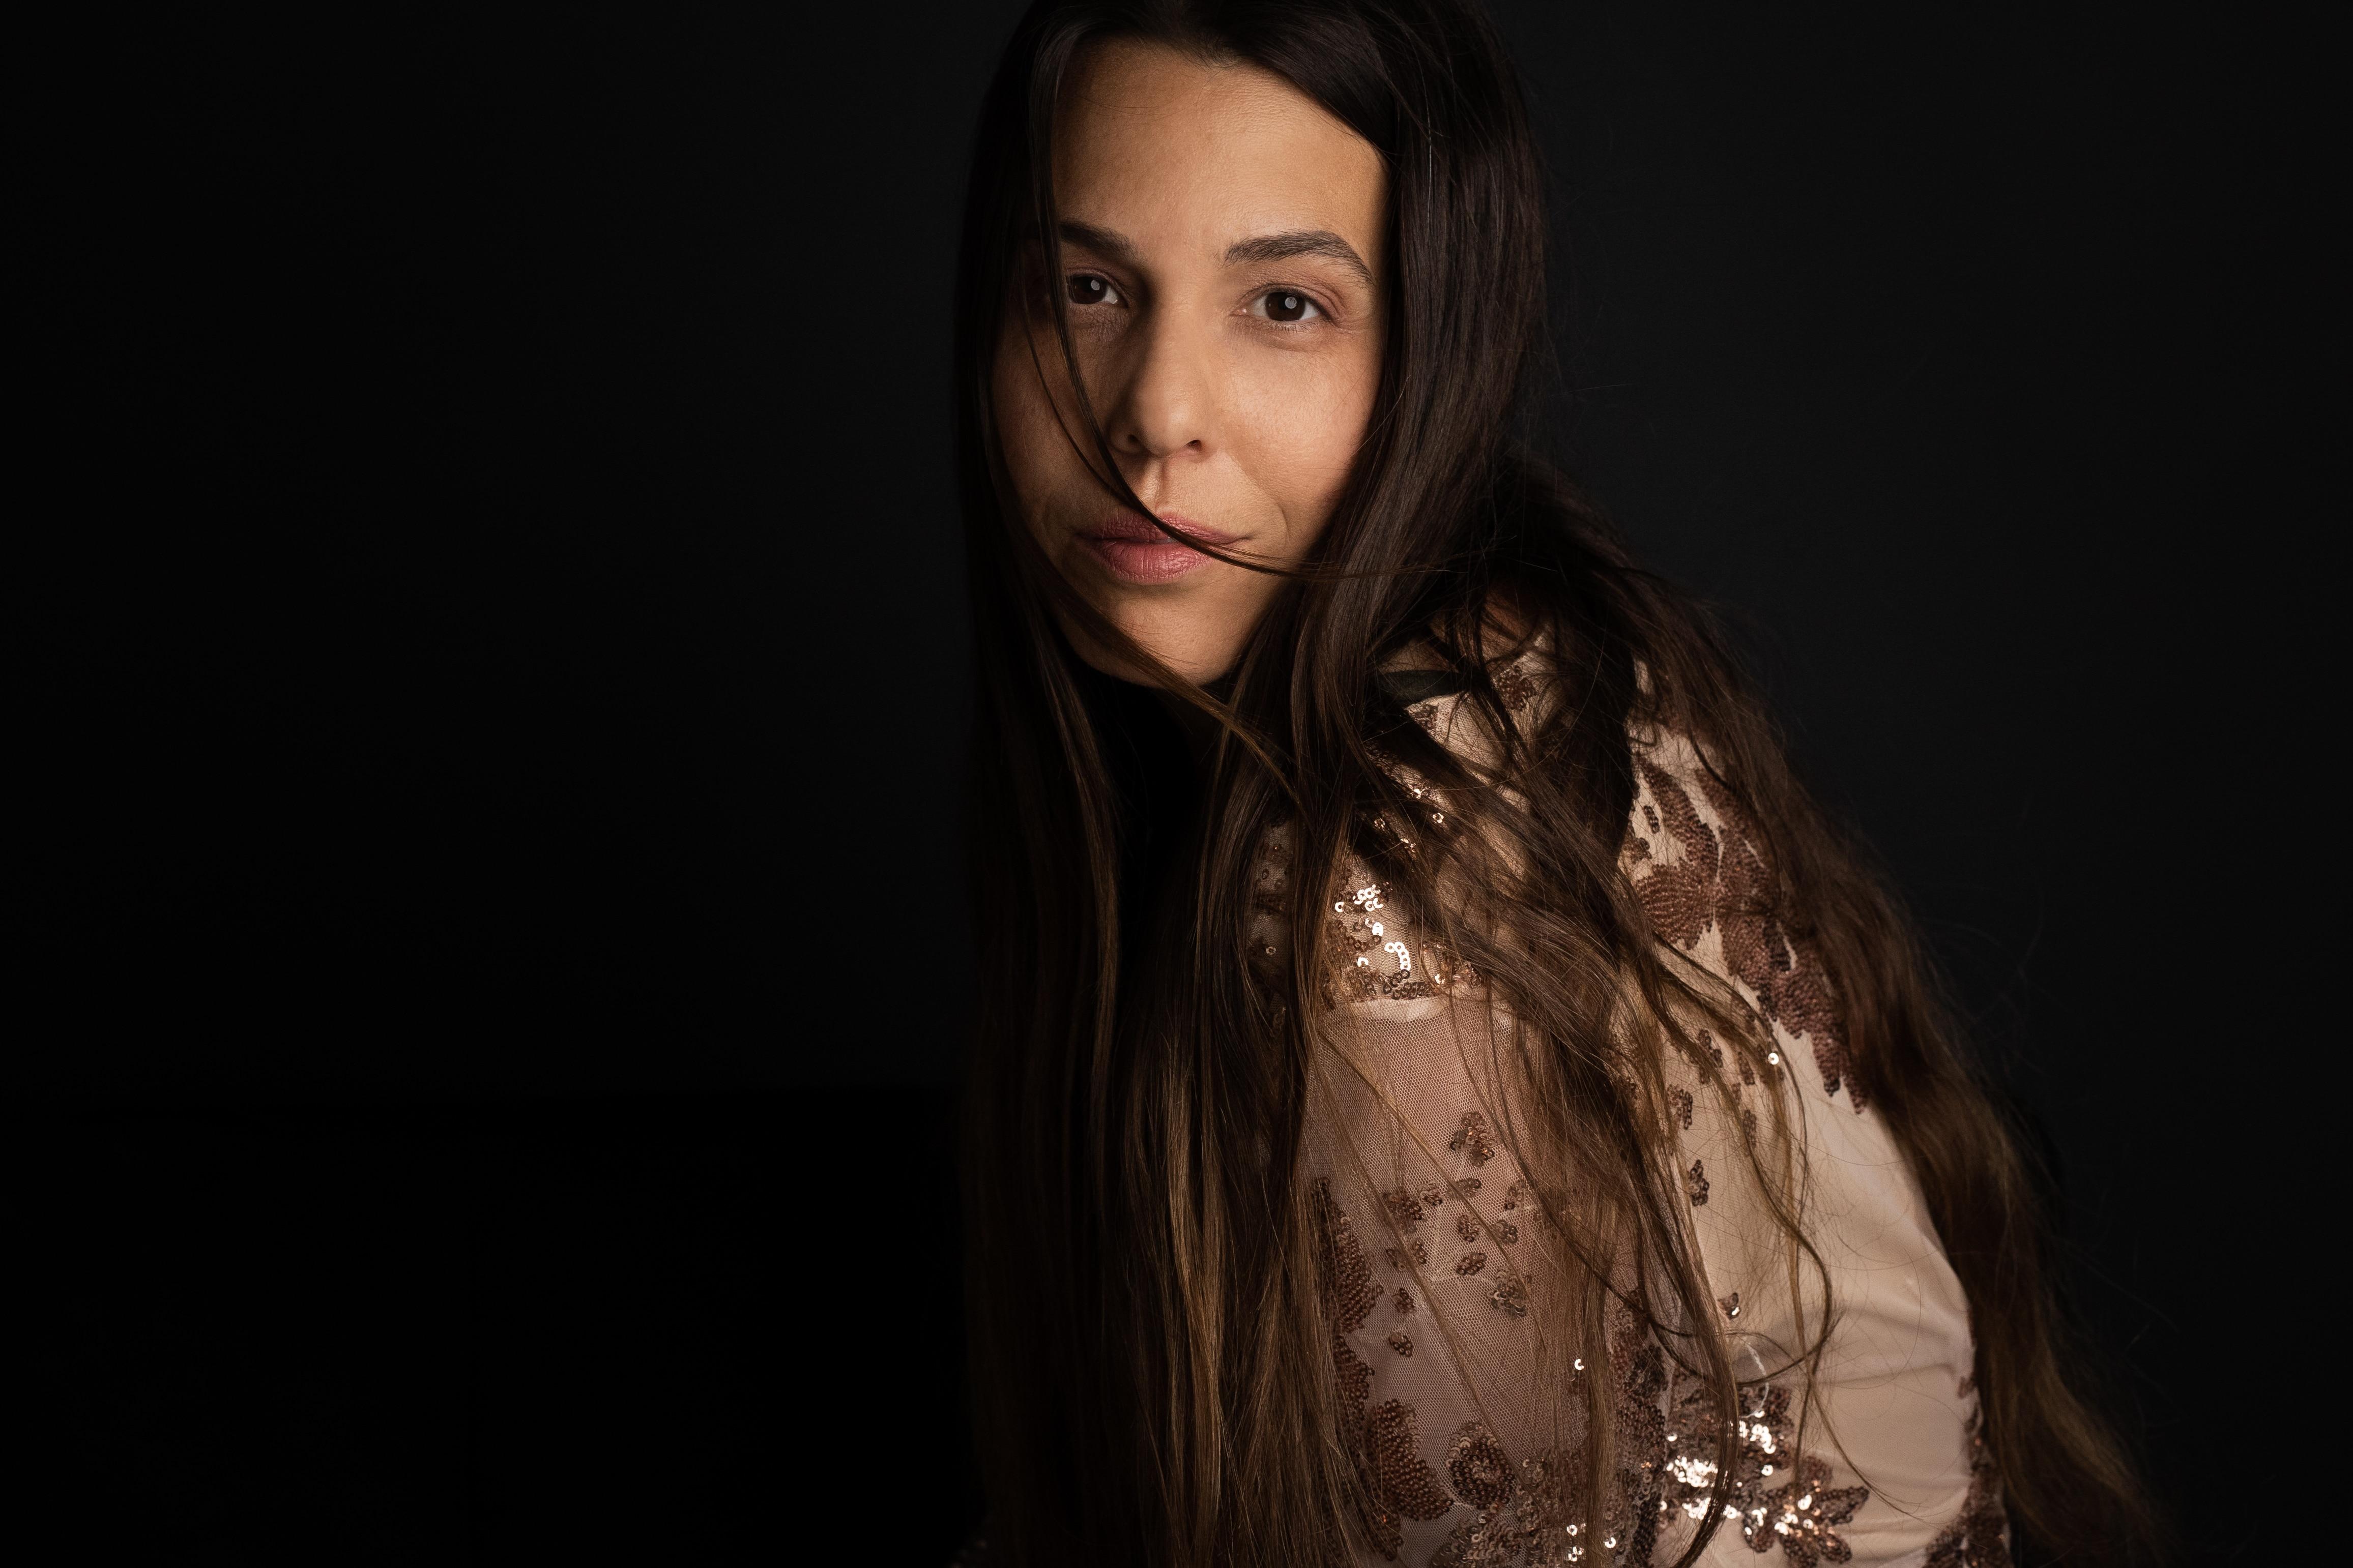 Hanover Ontario Photographer Jennifer Hibberd